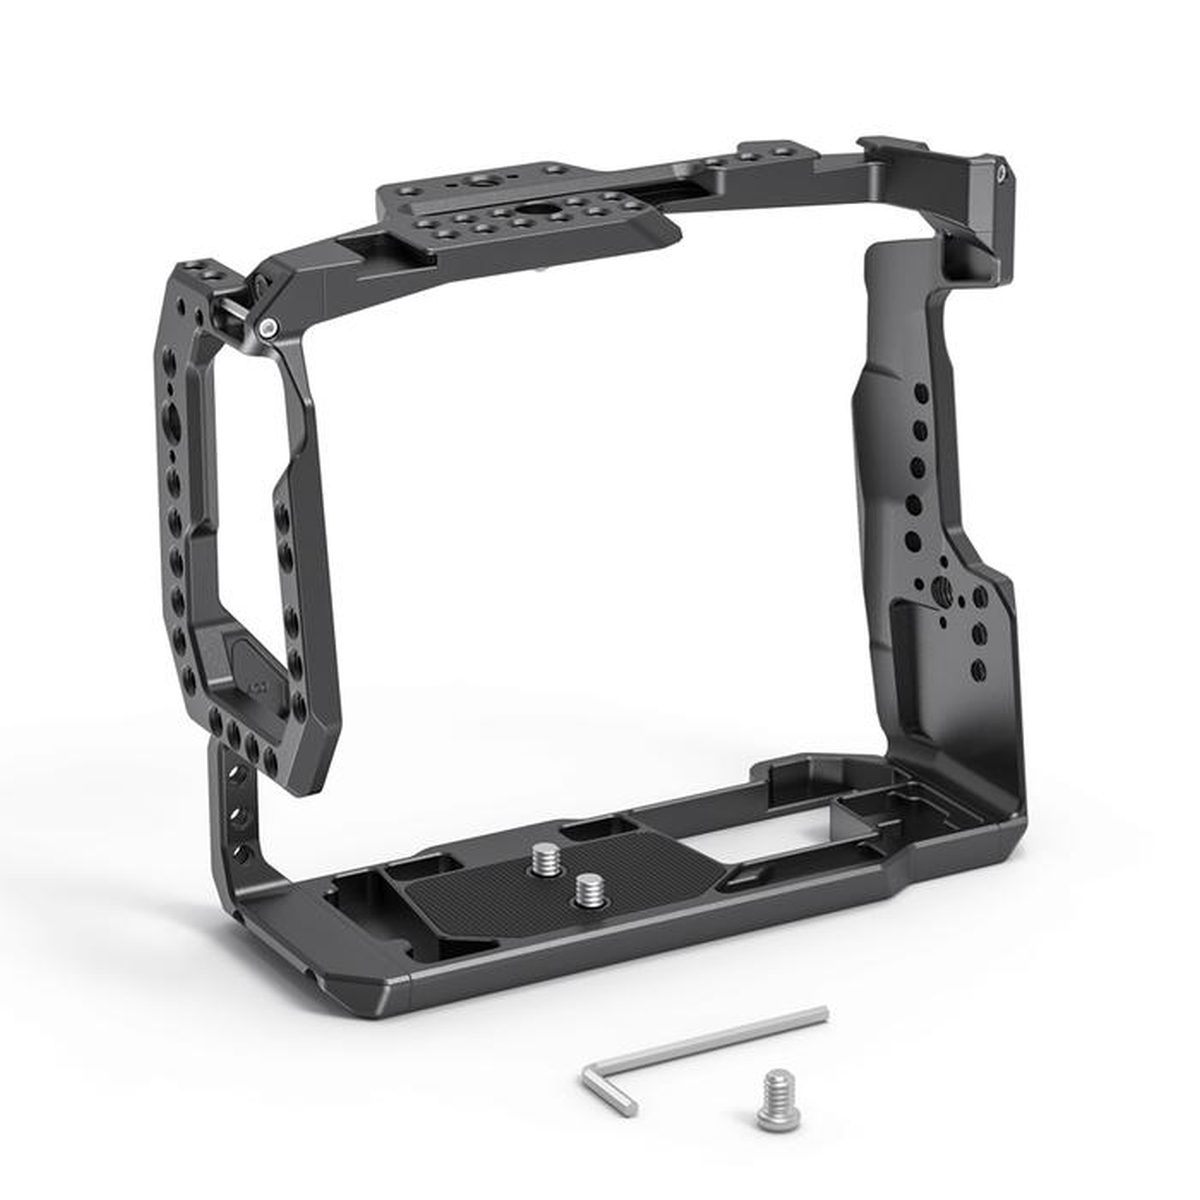 Smallrig Cage für Blackmagic Pocket 4k/6k